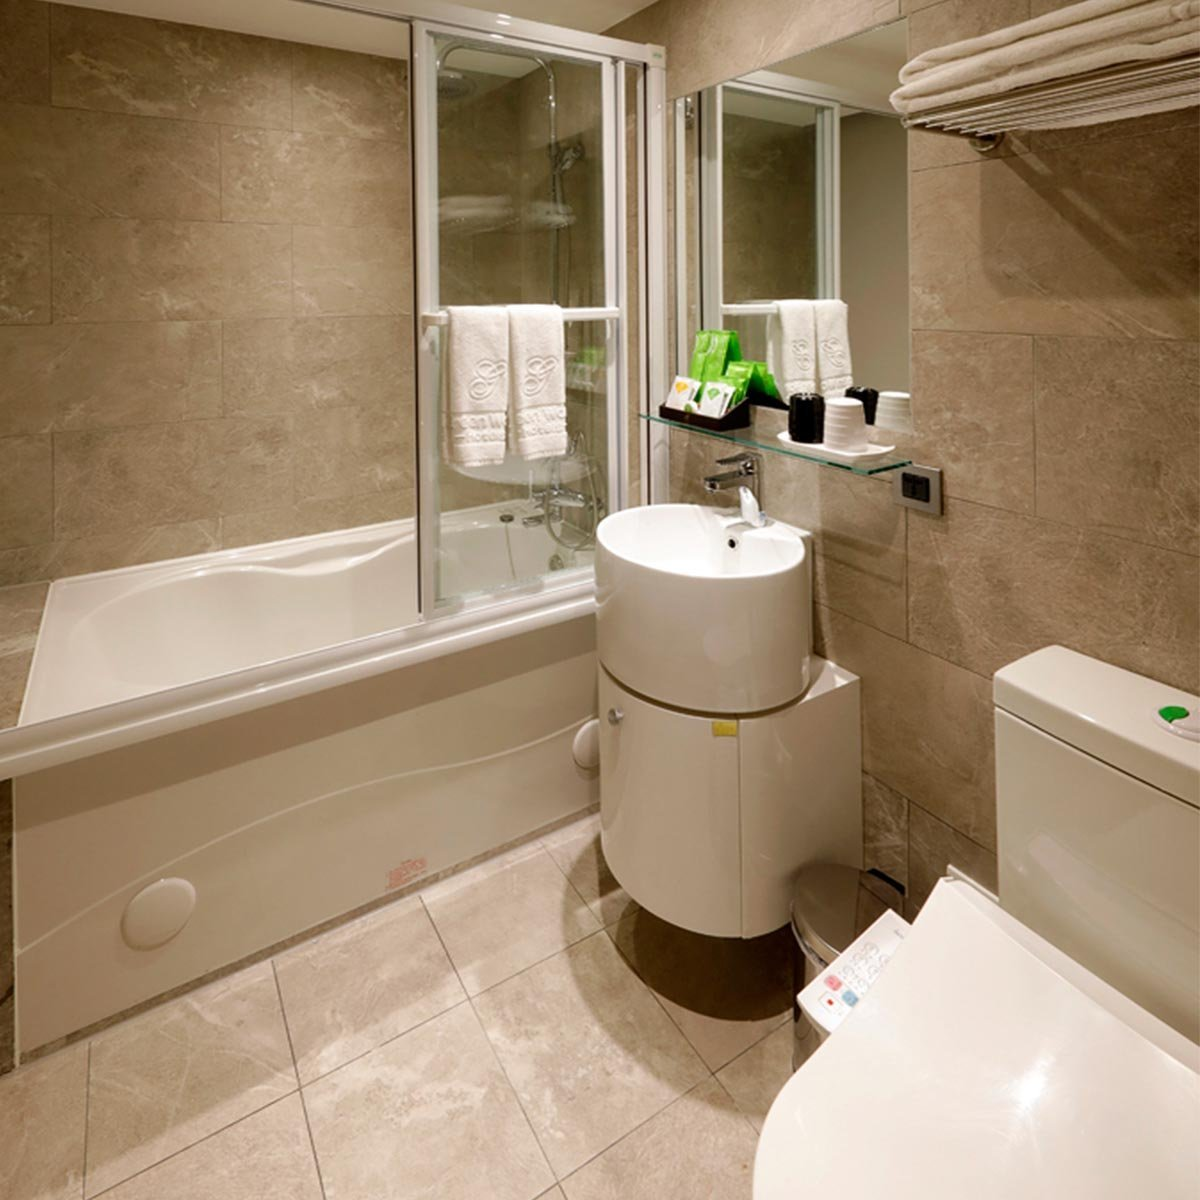 marble-bathtub